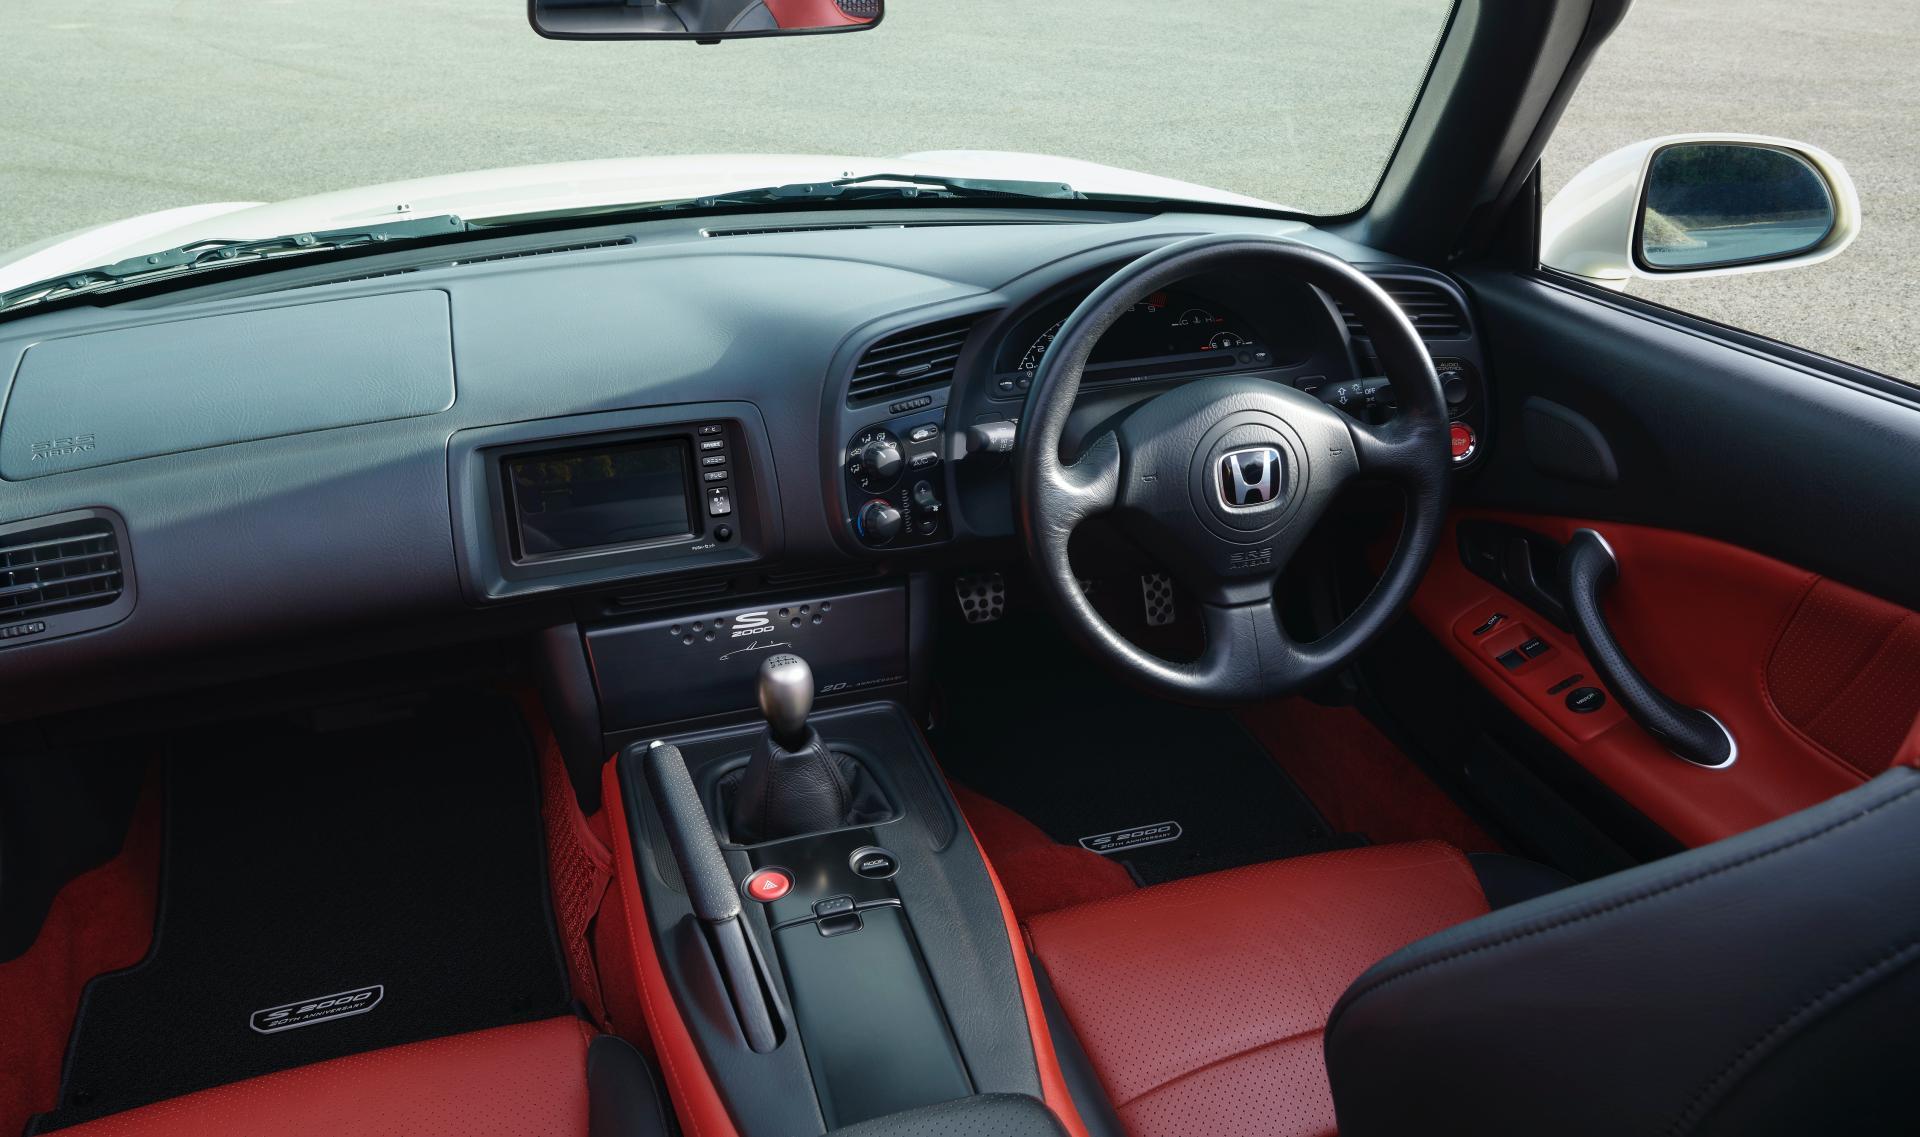 Honda-S2000-20th-Anniversary-genuine-accessories-9